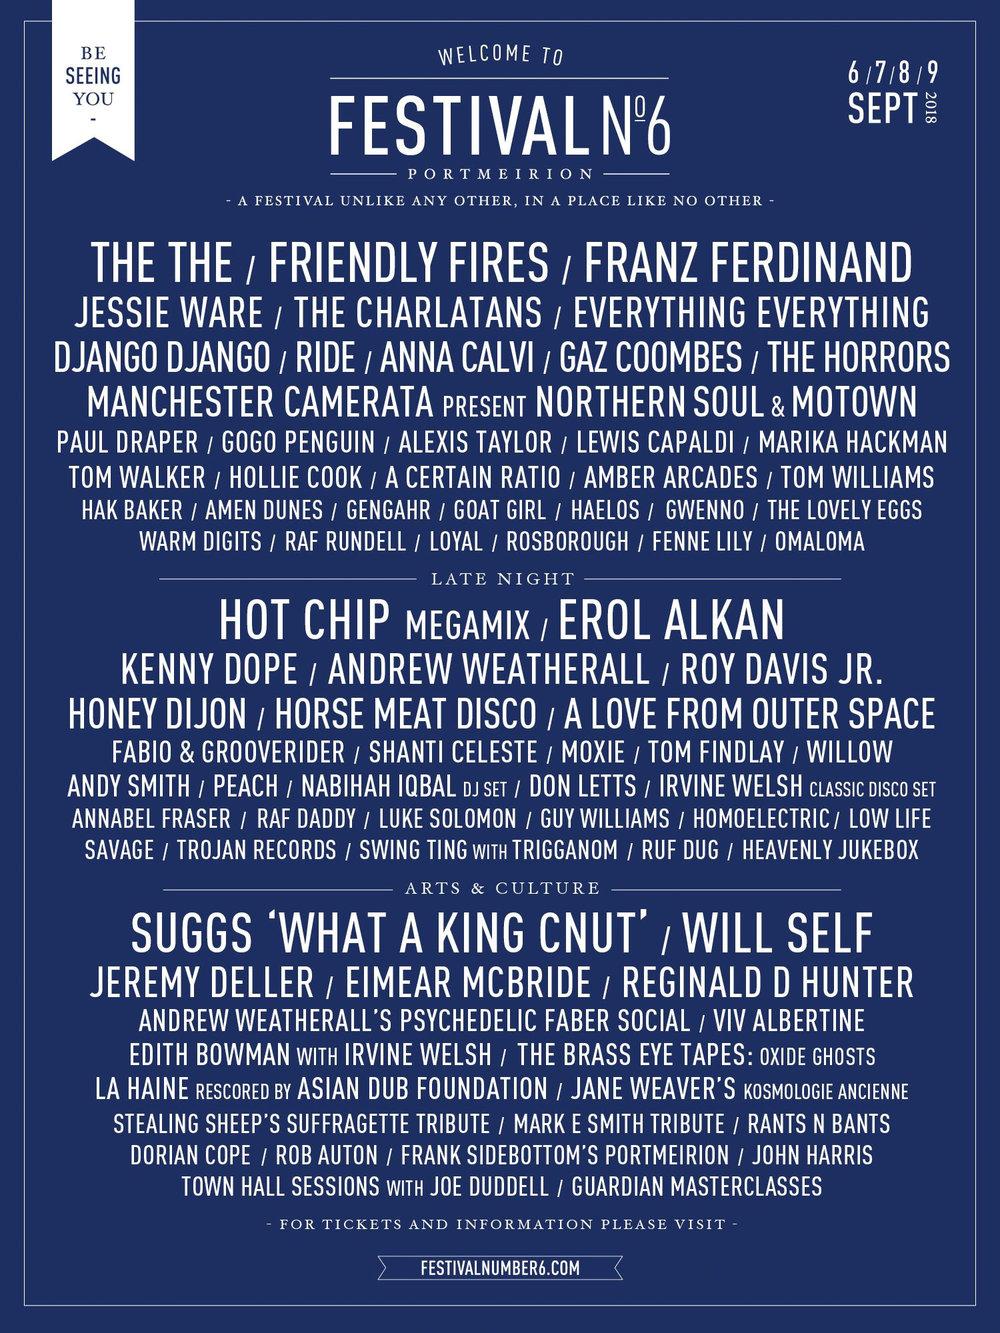 HEADLINERS: Franz Ferdinand, Friendly Fires, Hot Chip  WHEN & WHERE: 6-9th September 2018, Portmeirion, UK